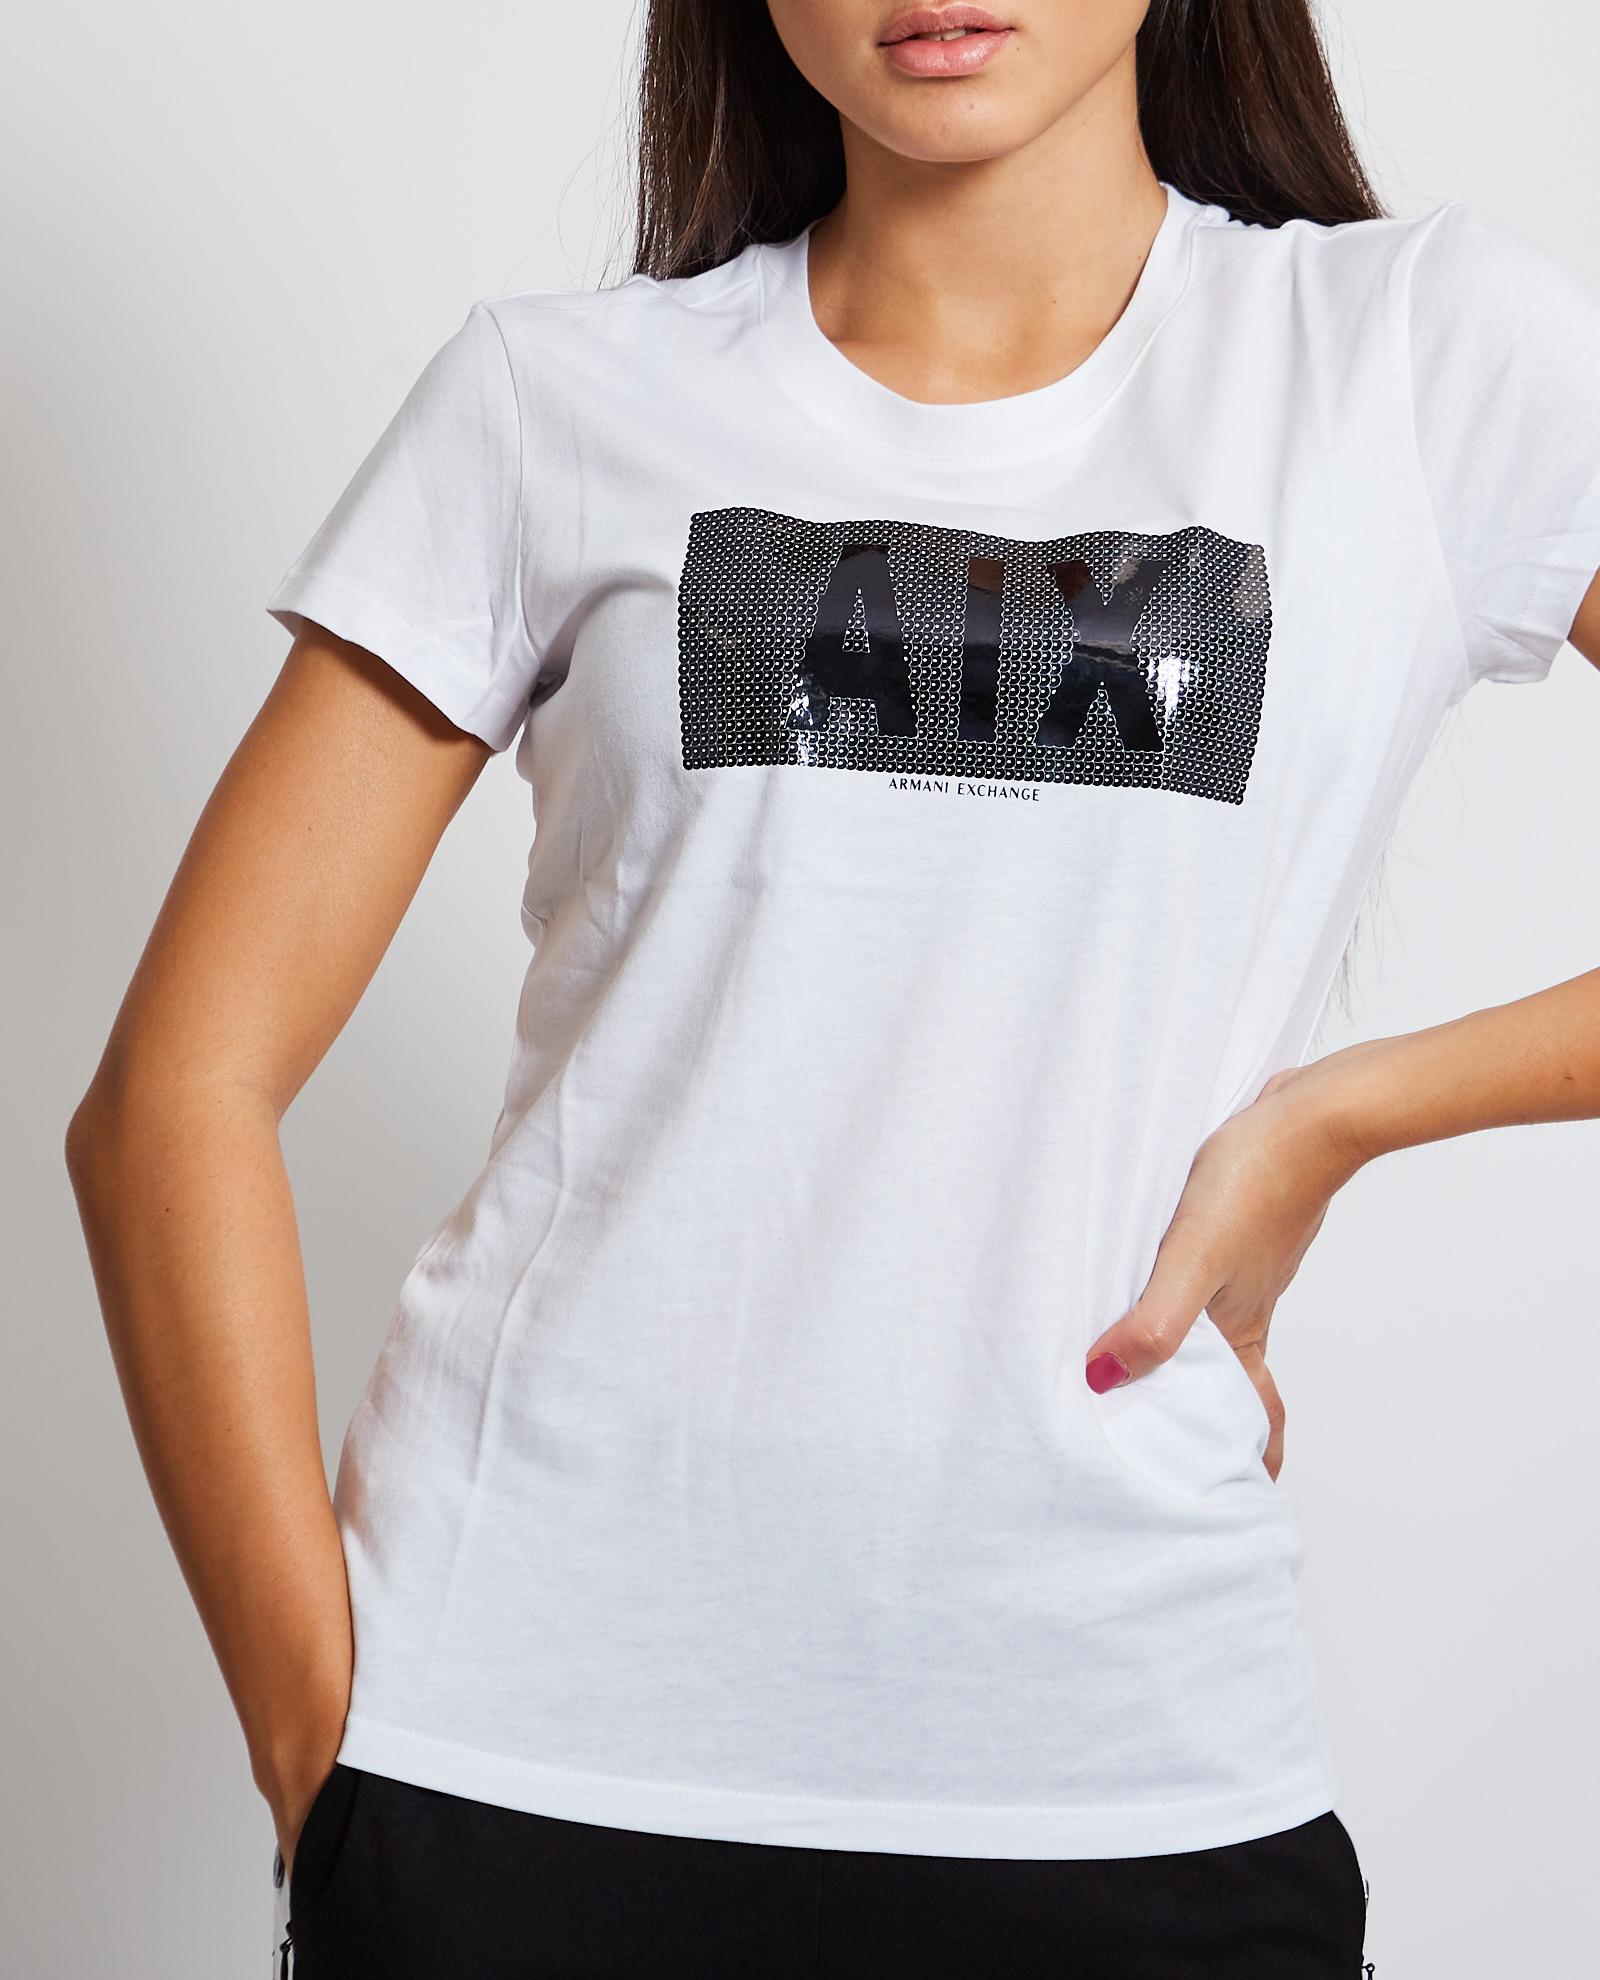 Maglia Armani Exchange ARMANI EXCHANGE   T-shirt   6KYTAV-YJ5MZ1000